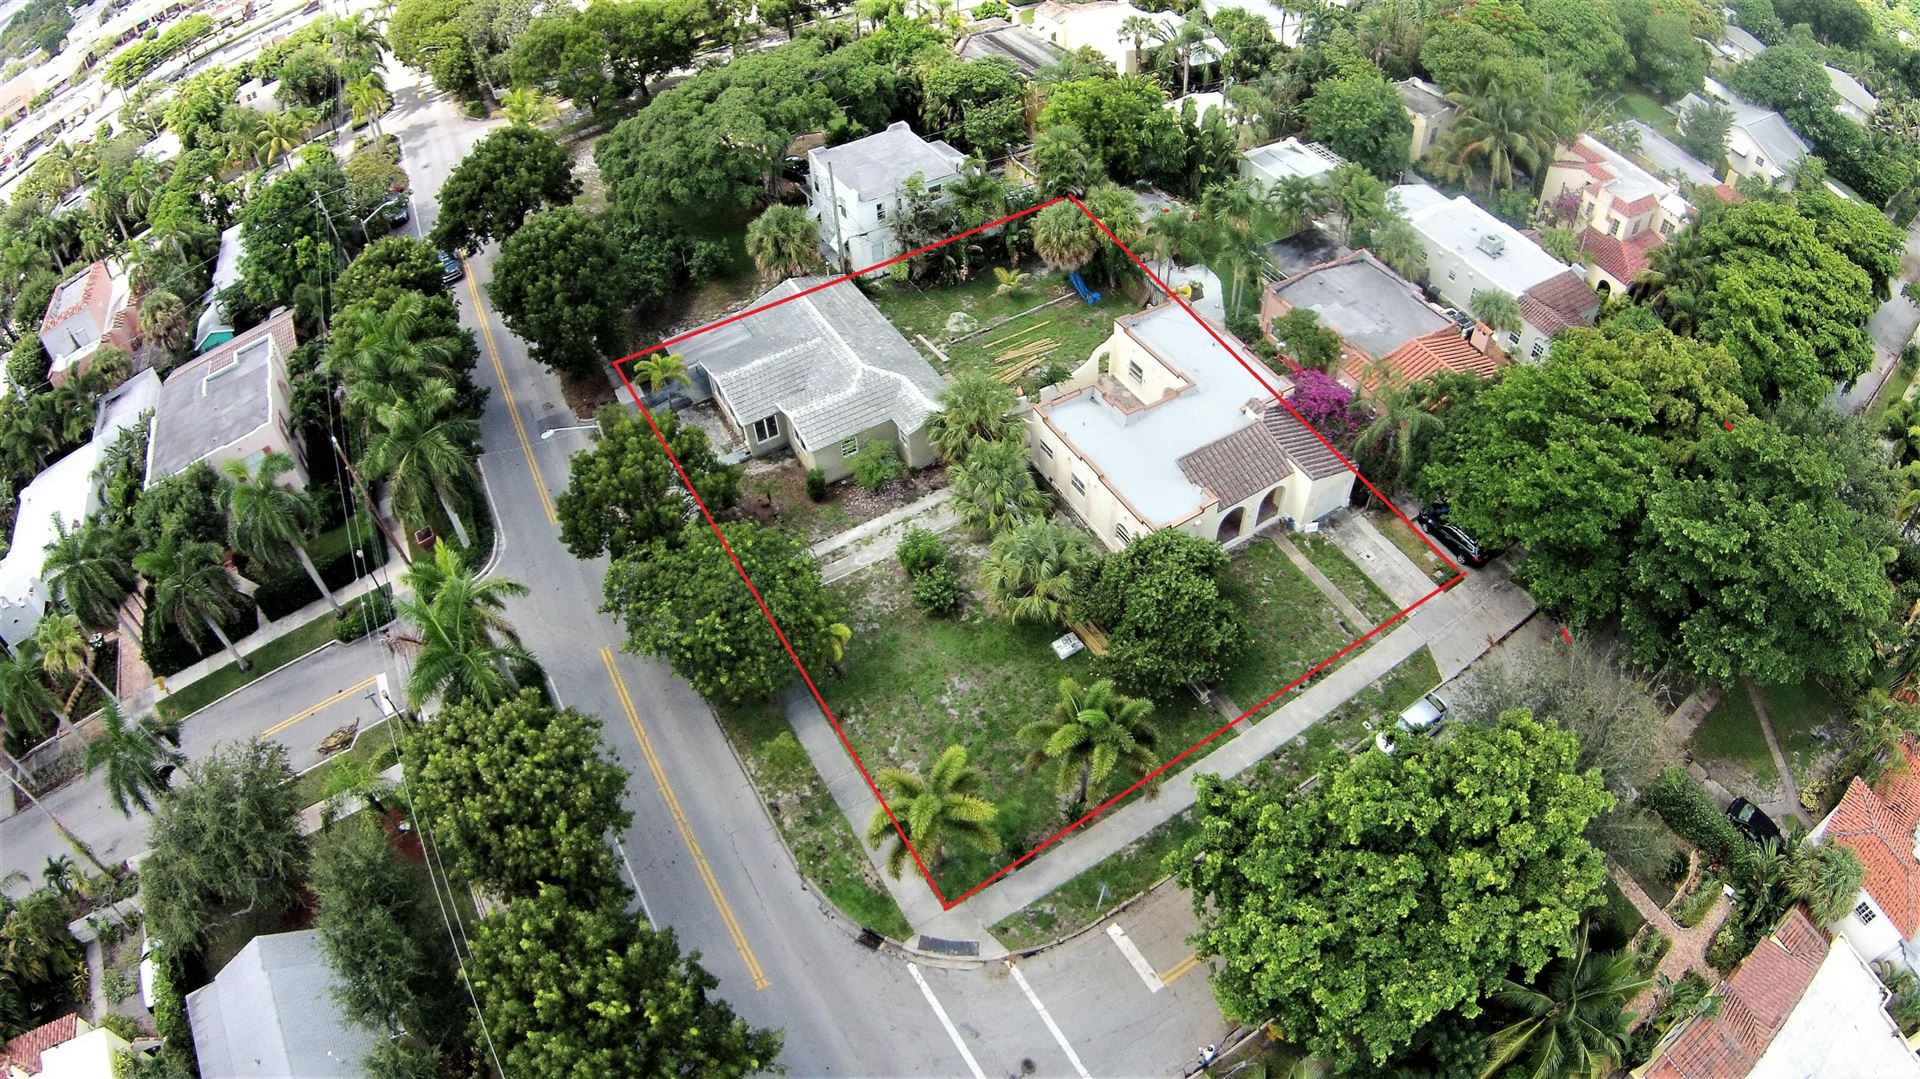 706 Sunset Road, West Palm Beach, FL 33401 - #: RX-10635842